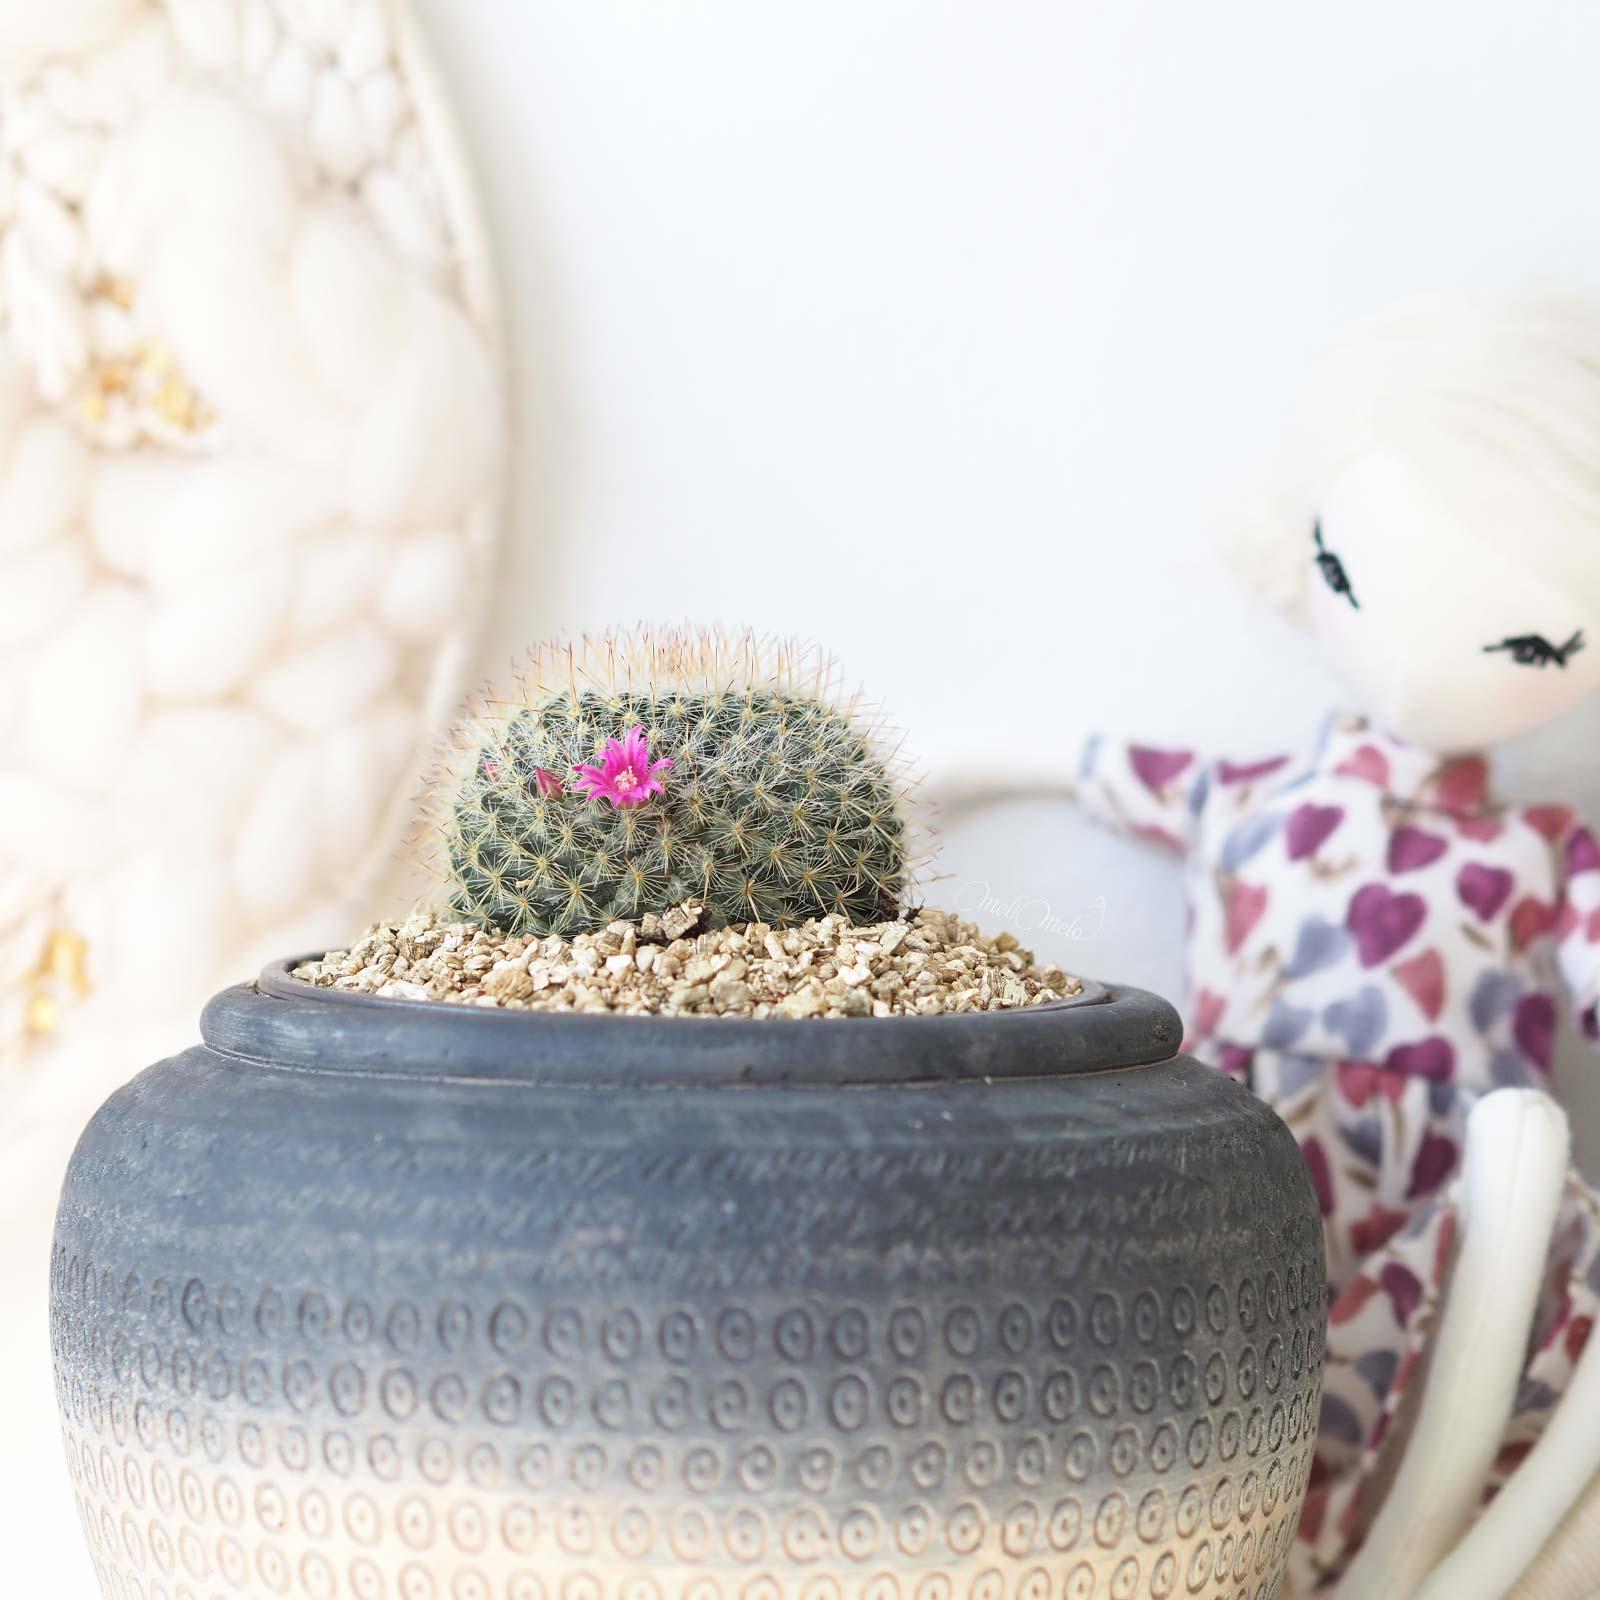 cactus coussin mamillaria candida floraison Boutique MeliMelo